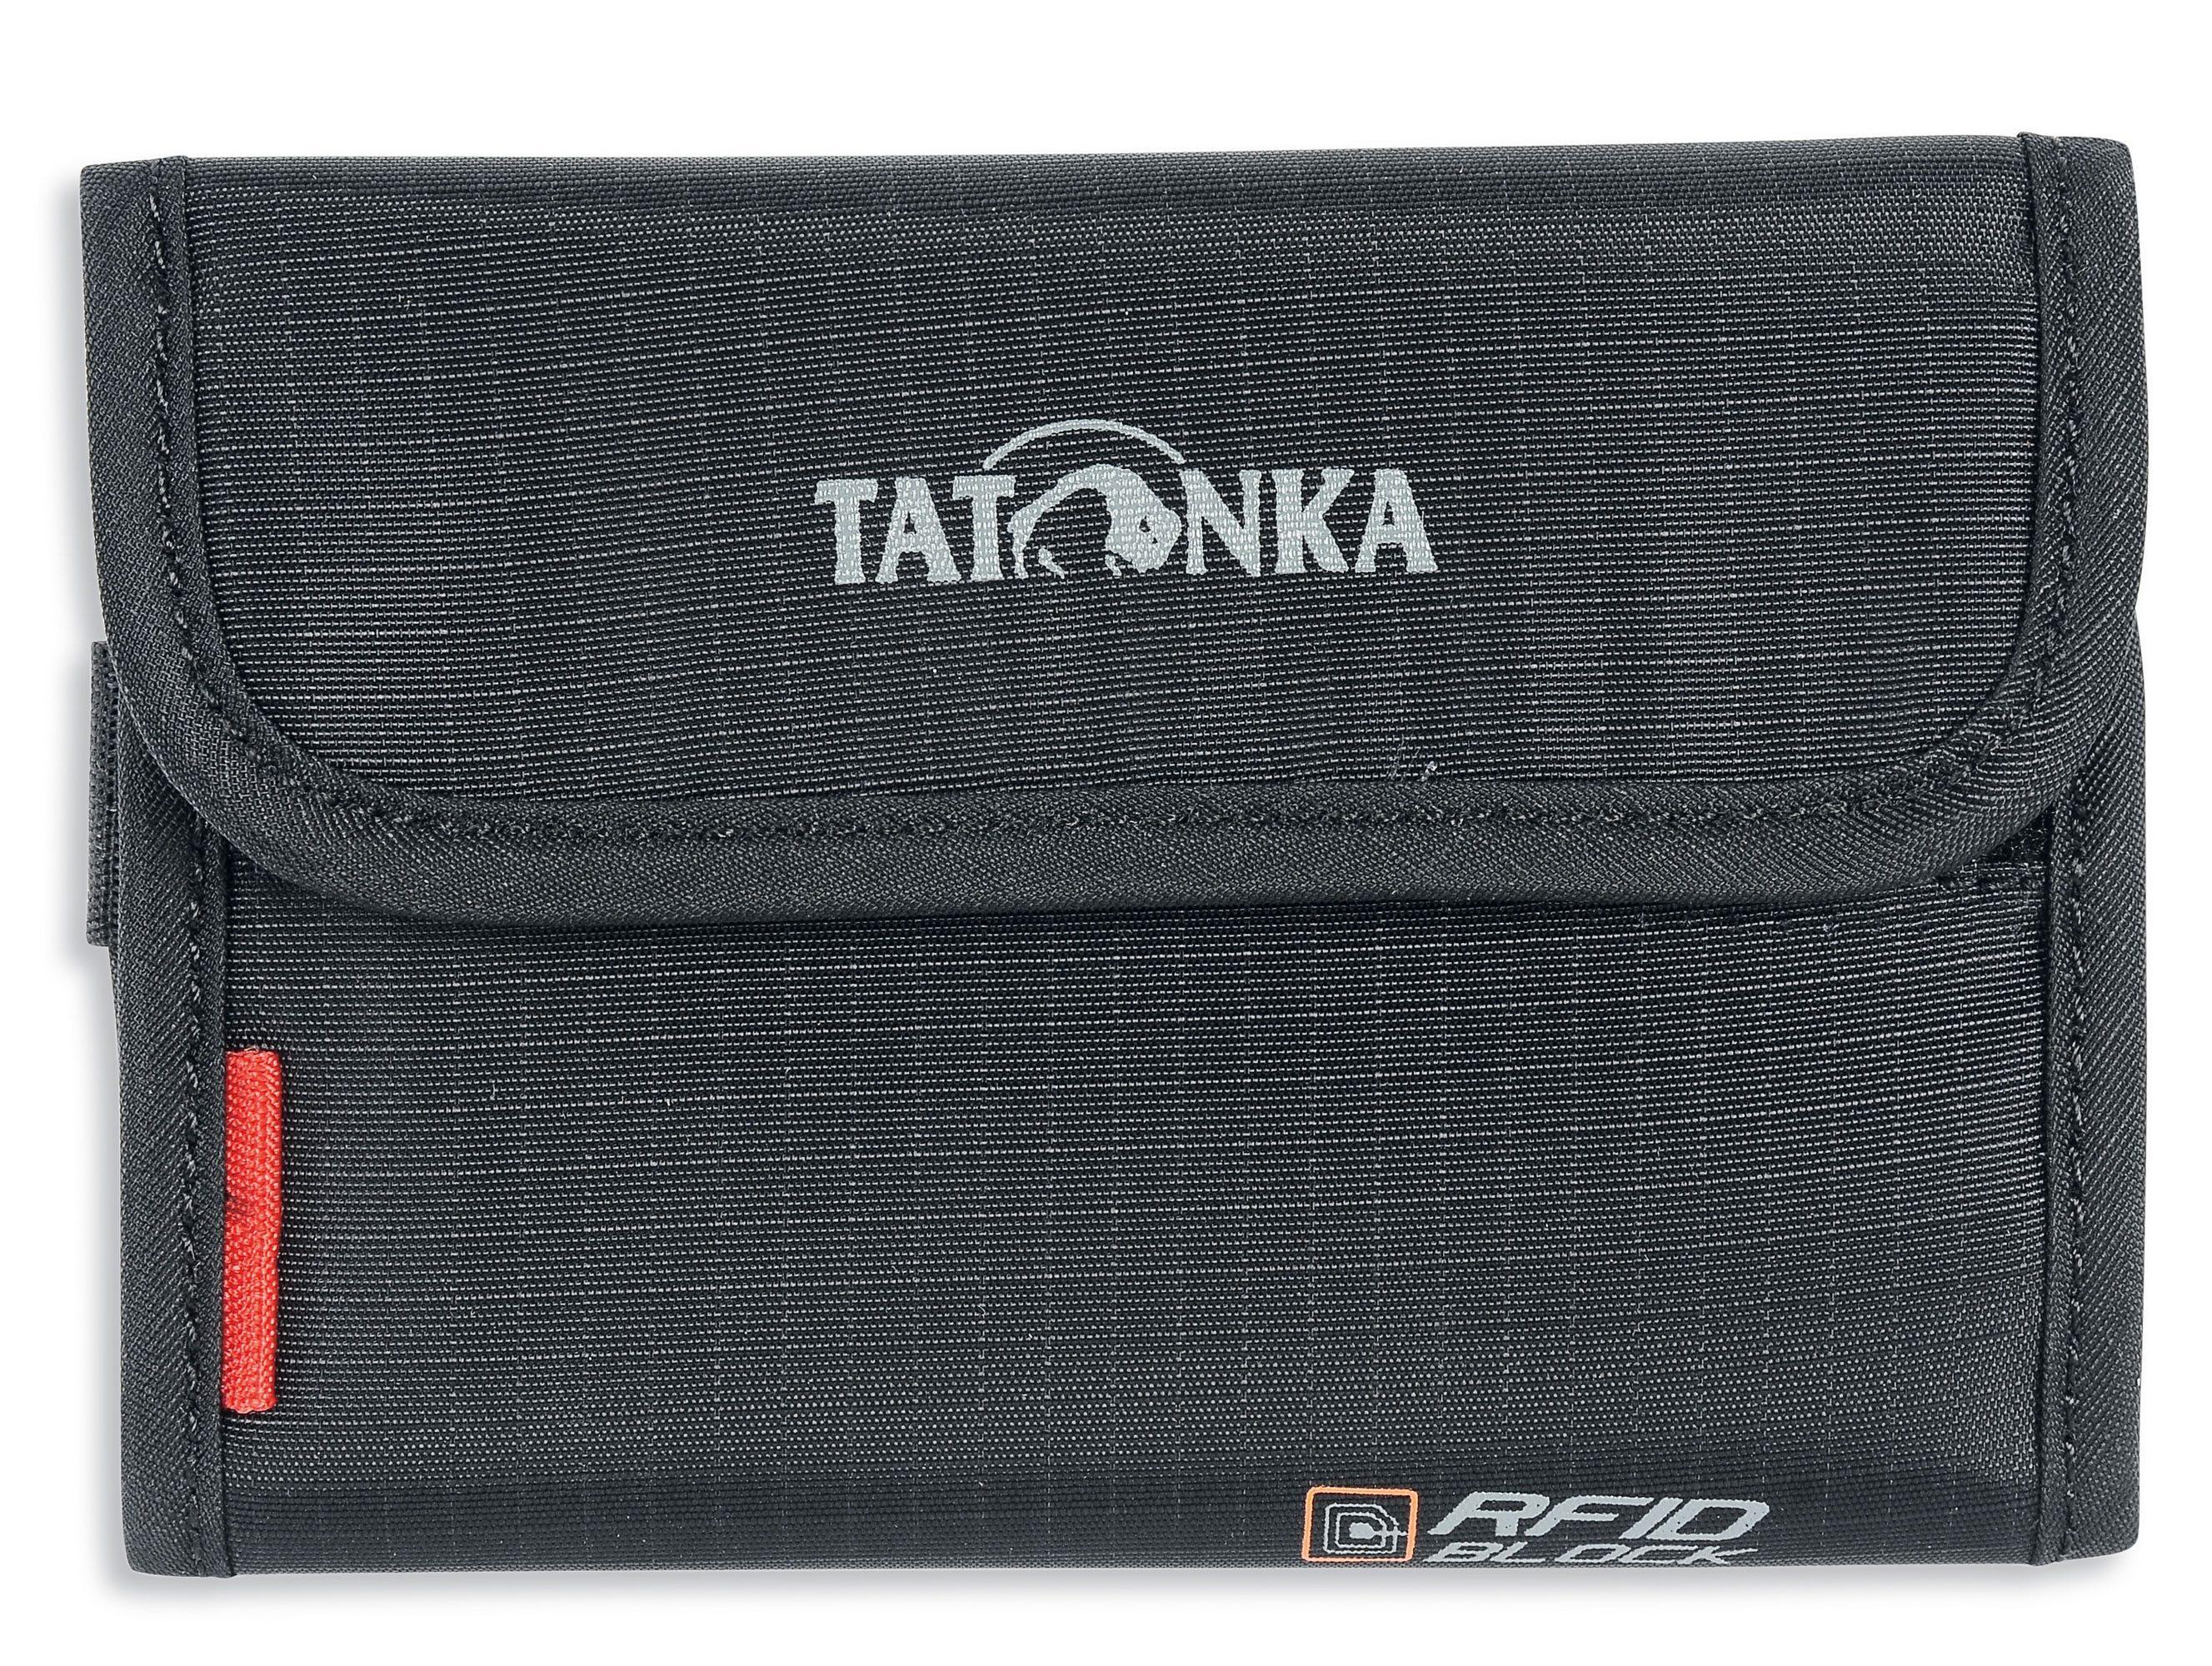 Tatonka® B« Wertsachenaufbewahrung Rfid »money Box UVSpqMz